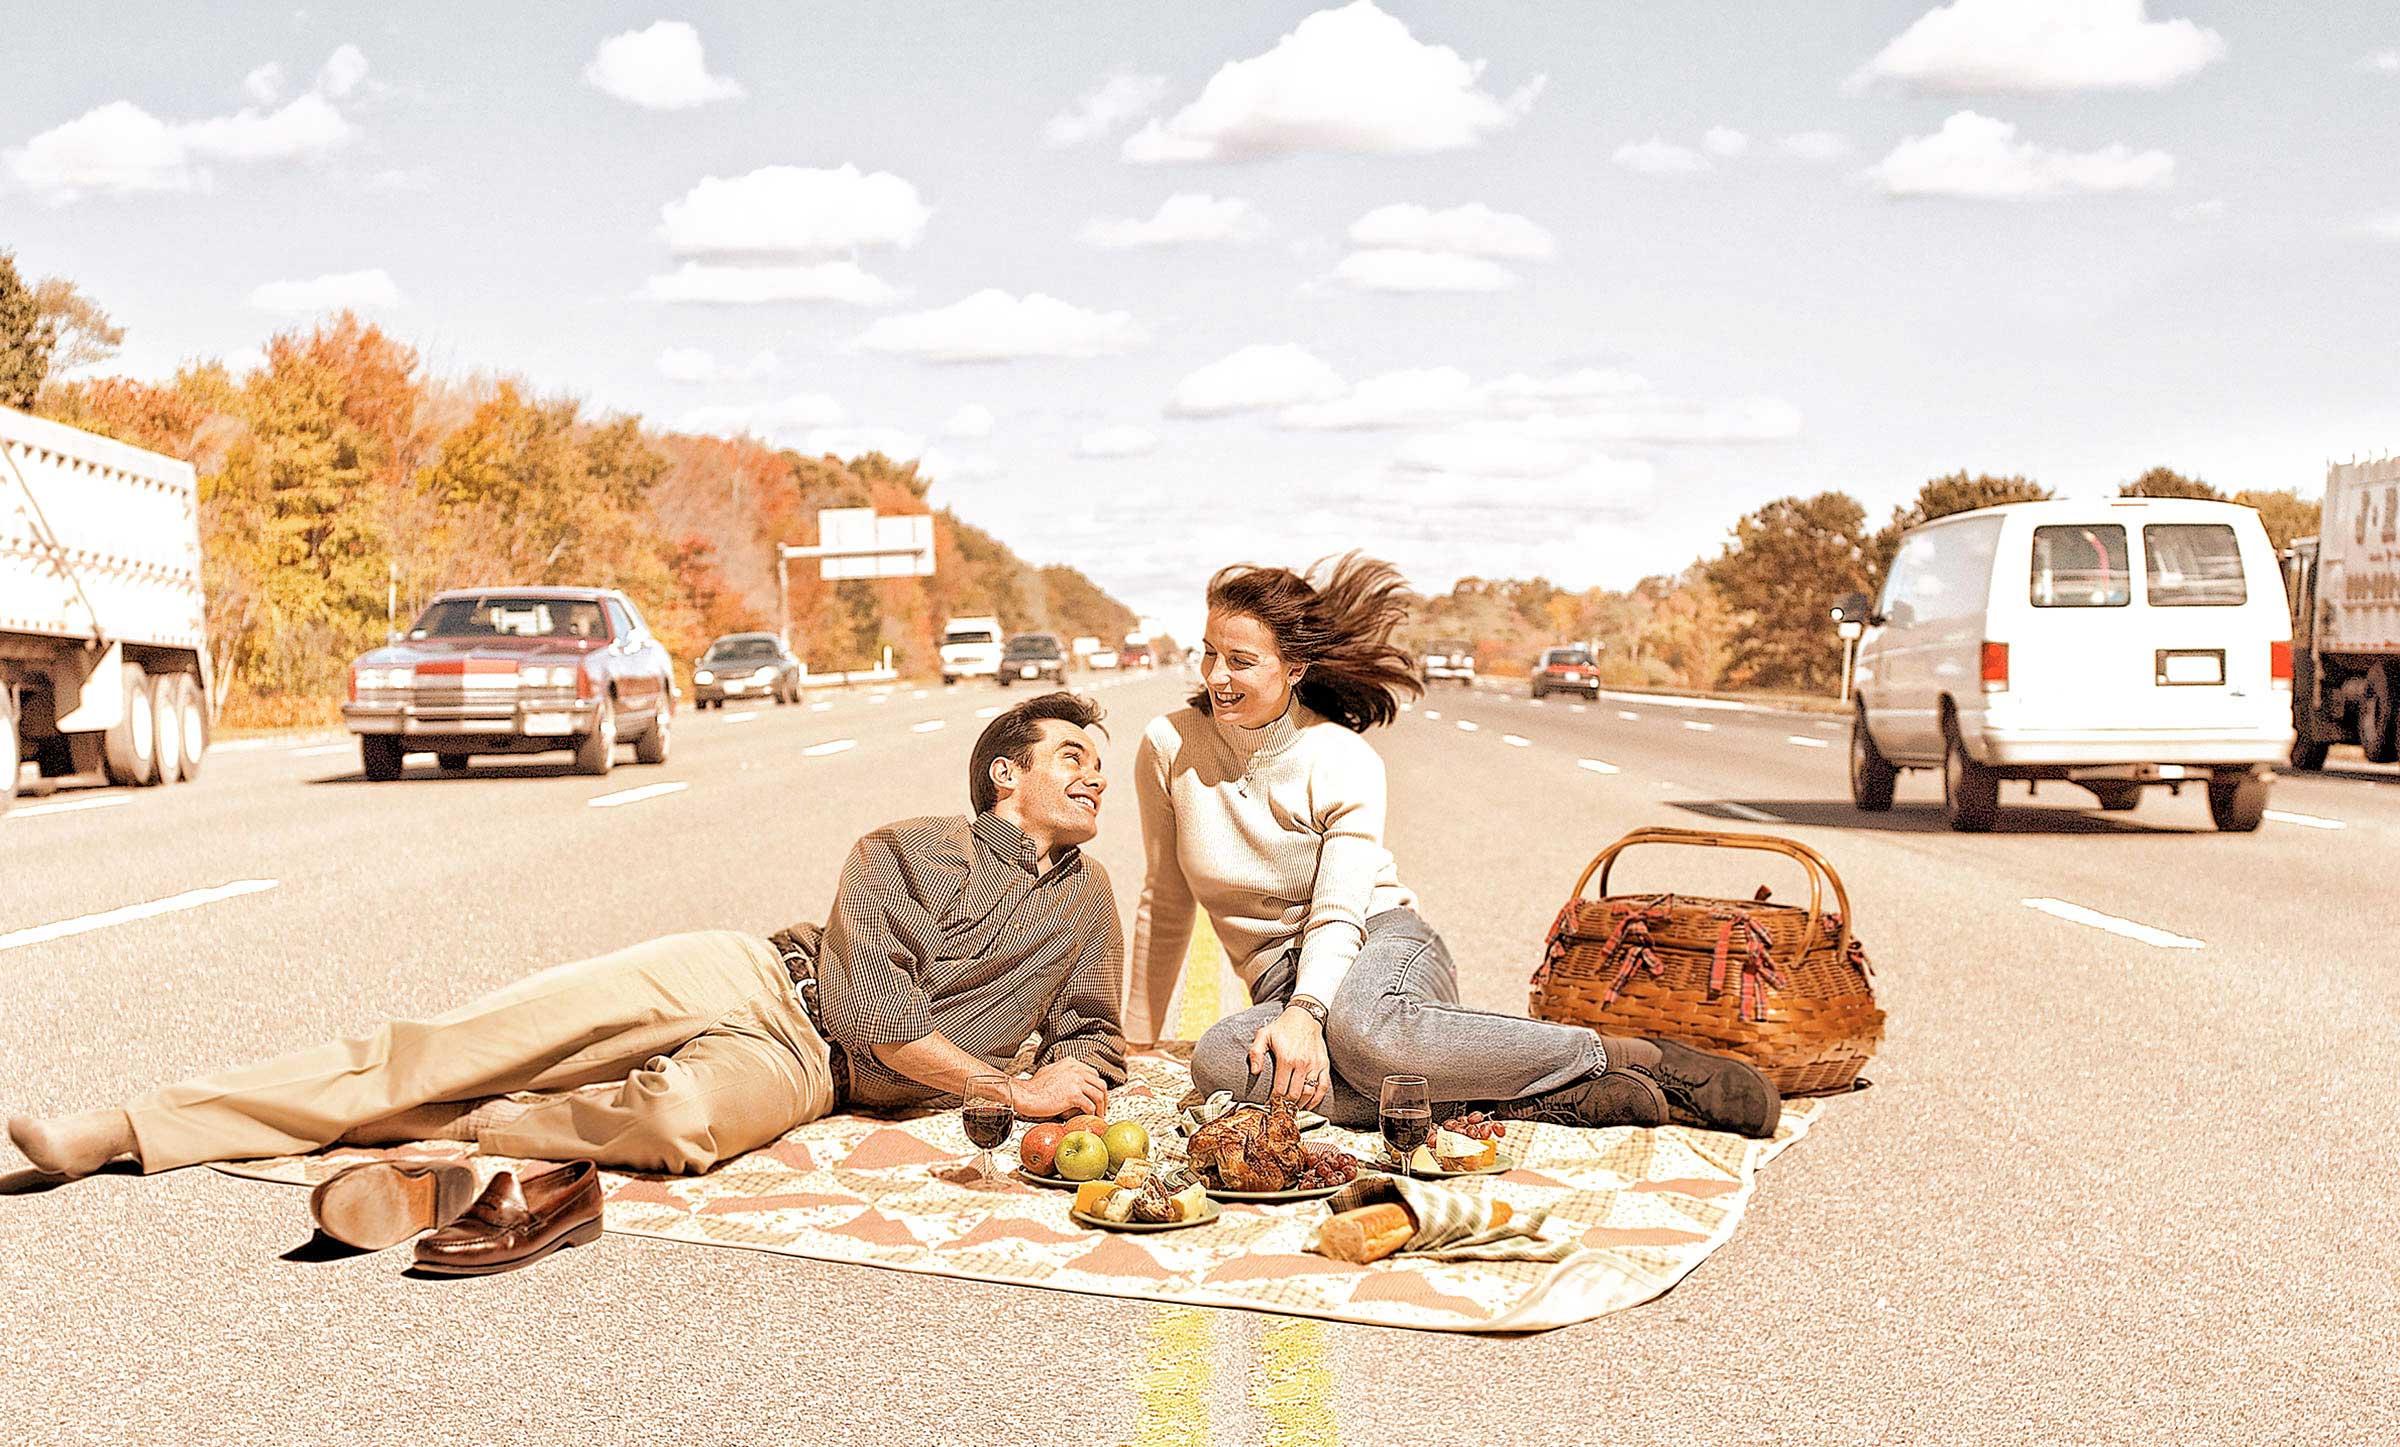 picnic-on-highway.jpg